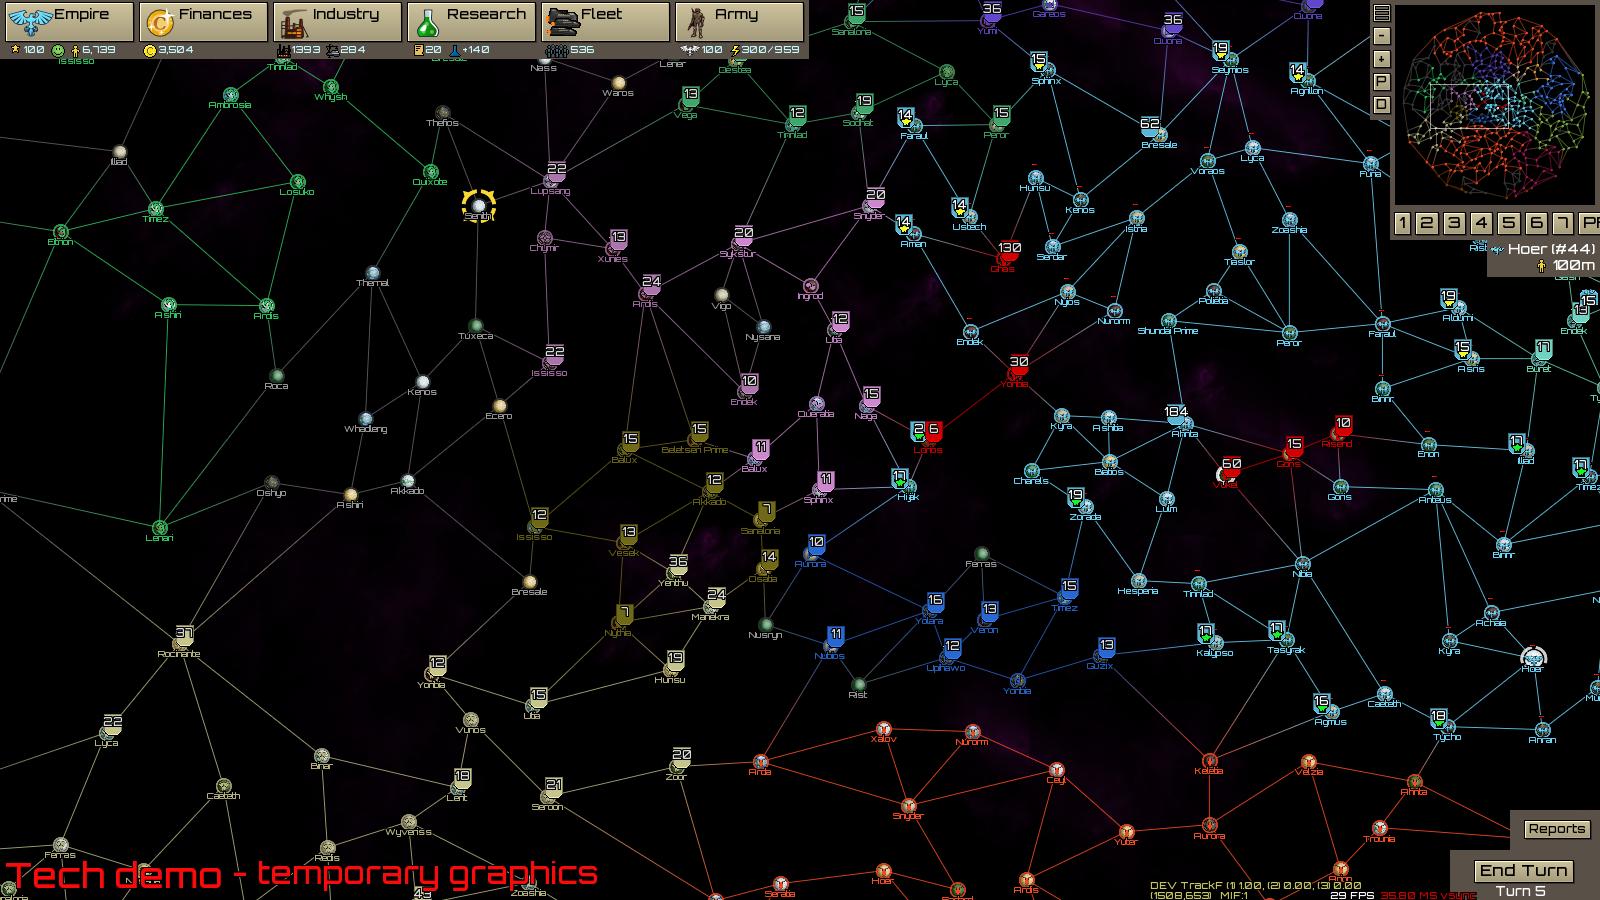 pse screenshot galaxybig16 9